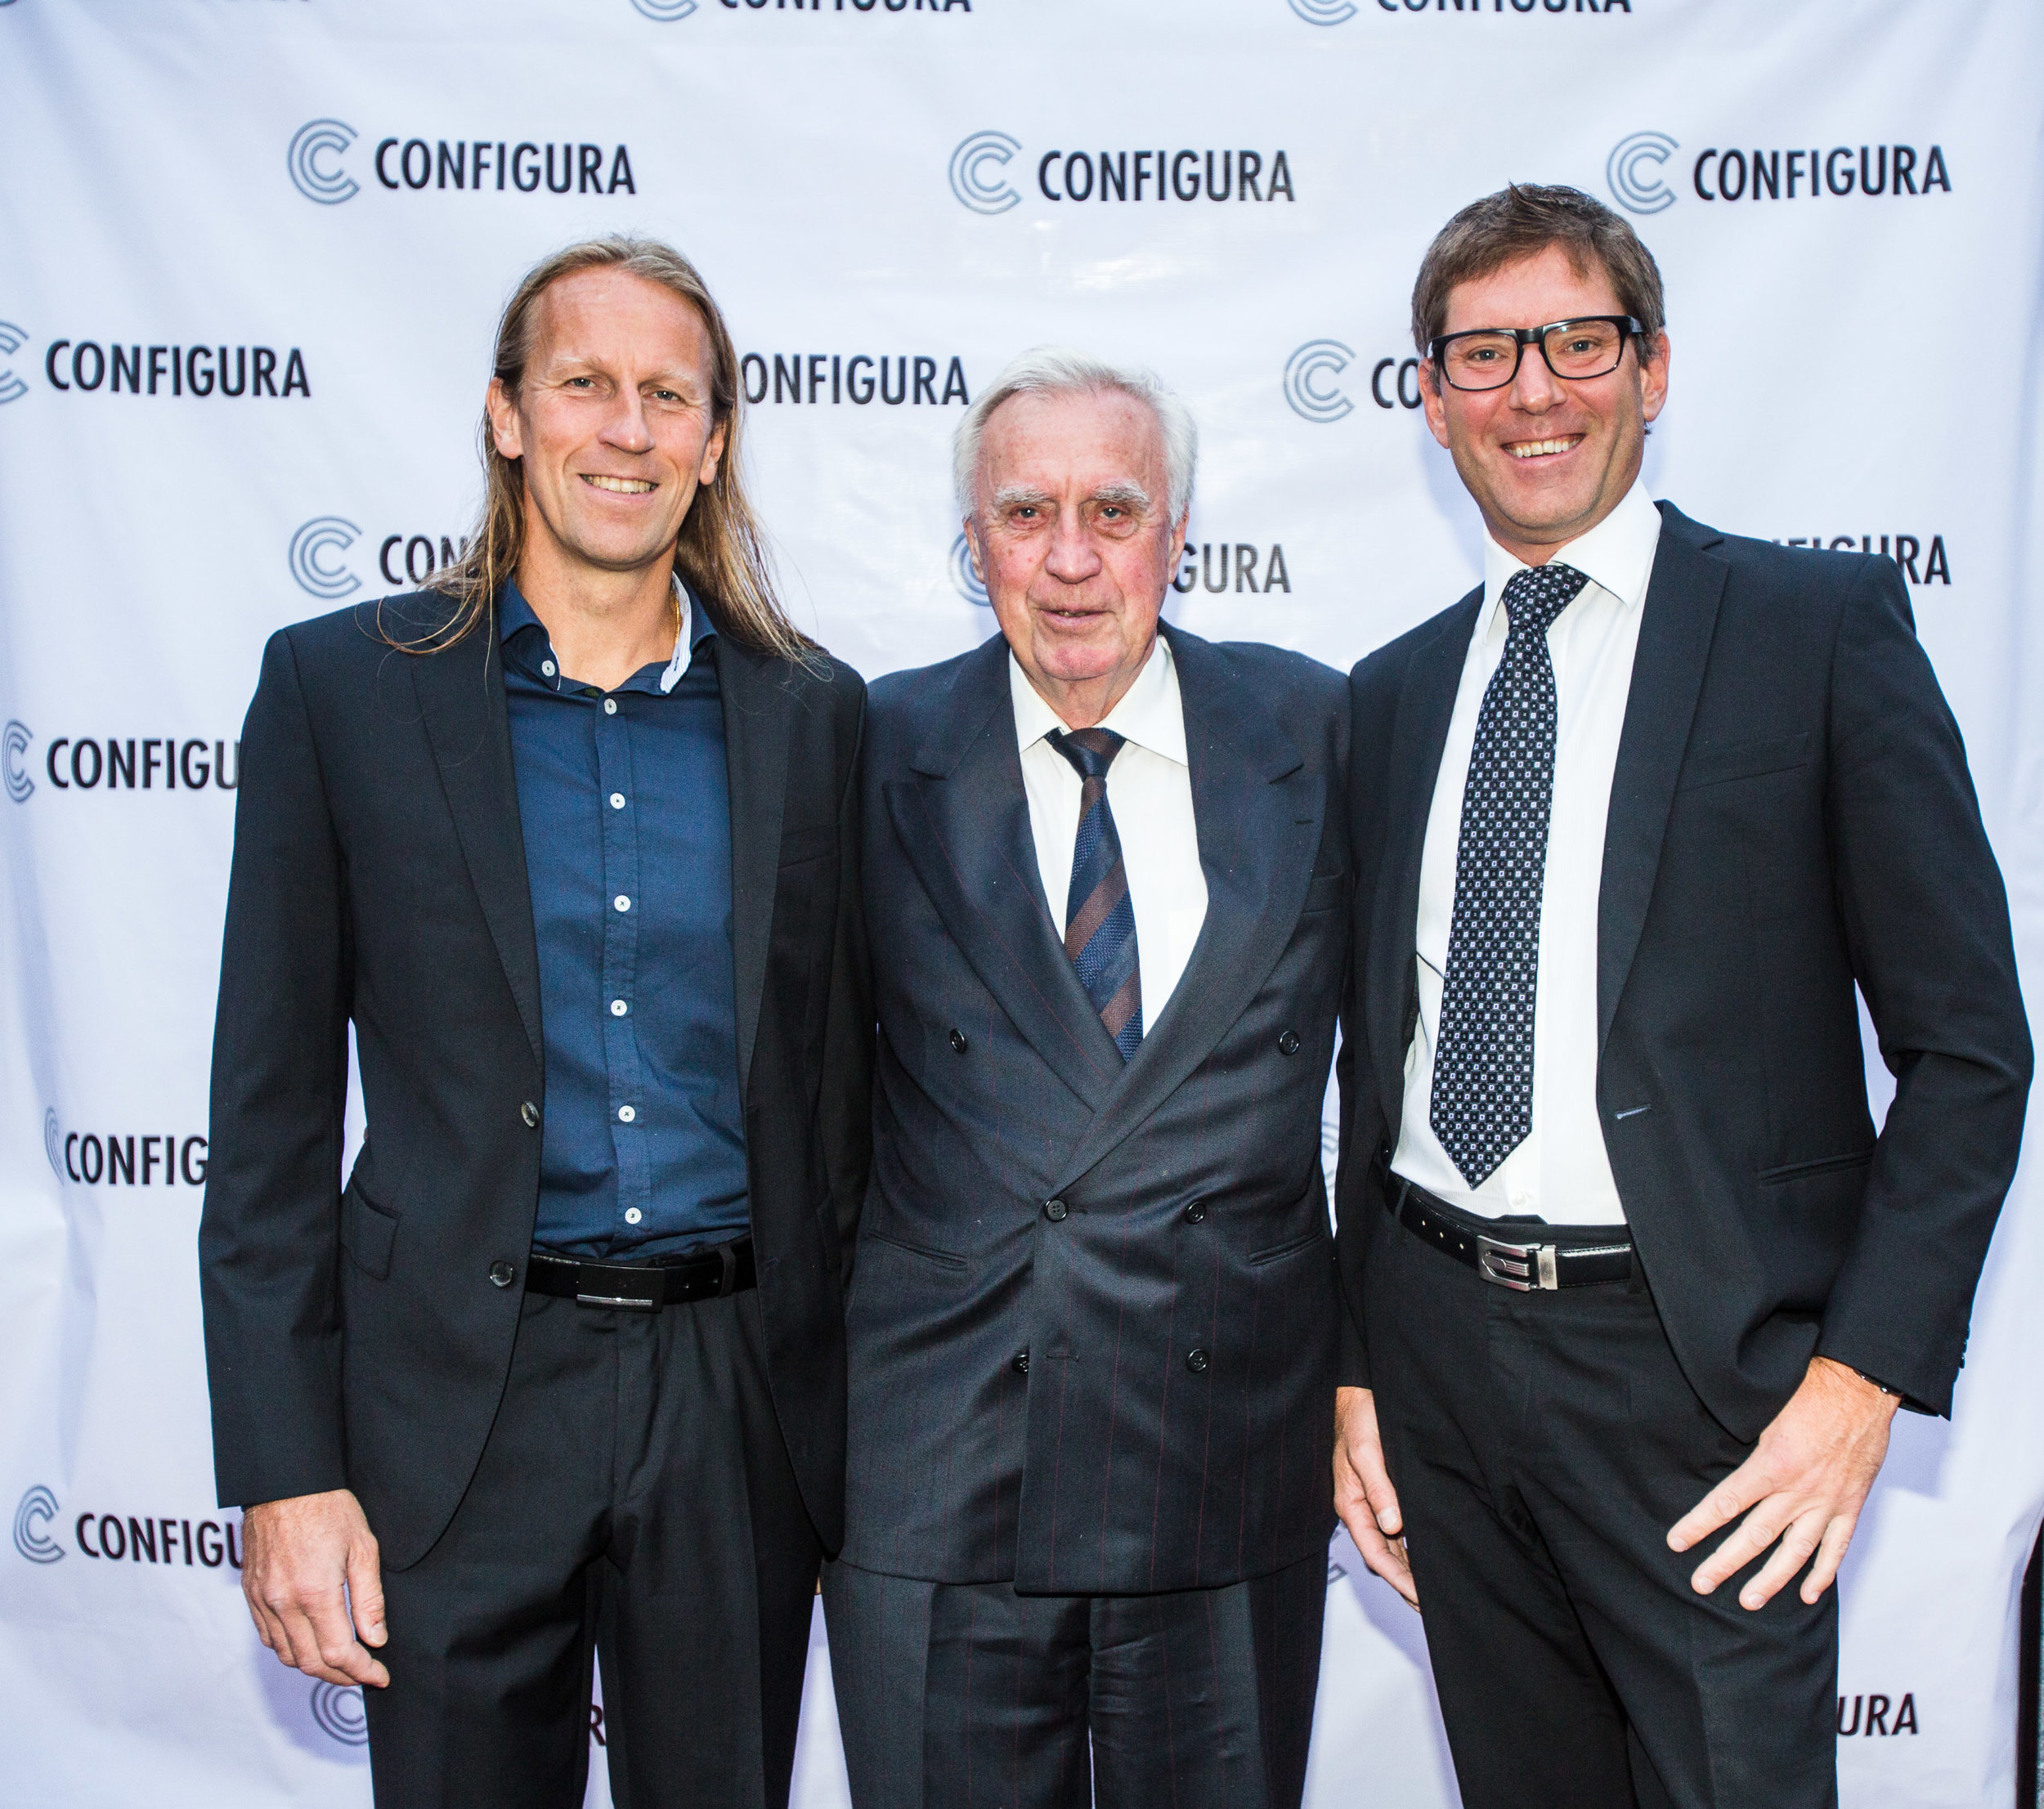 Configura Founders Göran Rydqvist, Sune Rydqvist and Johan Lyreborn at Configura's 25th anniversary celebration in Sweden in 2015